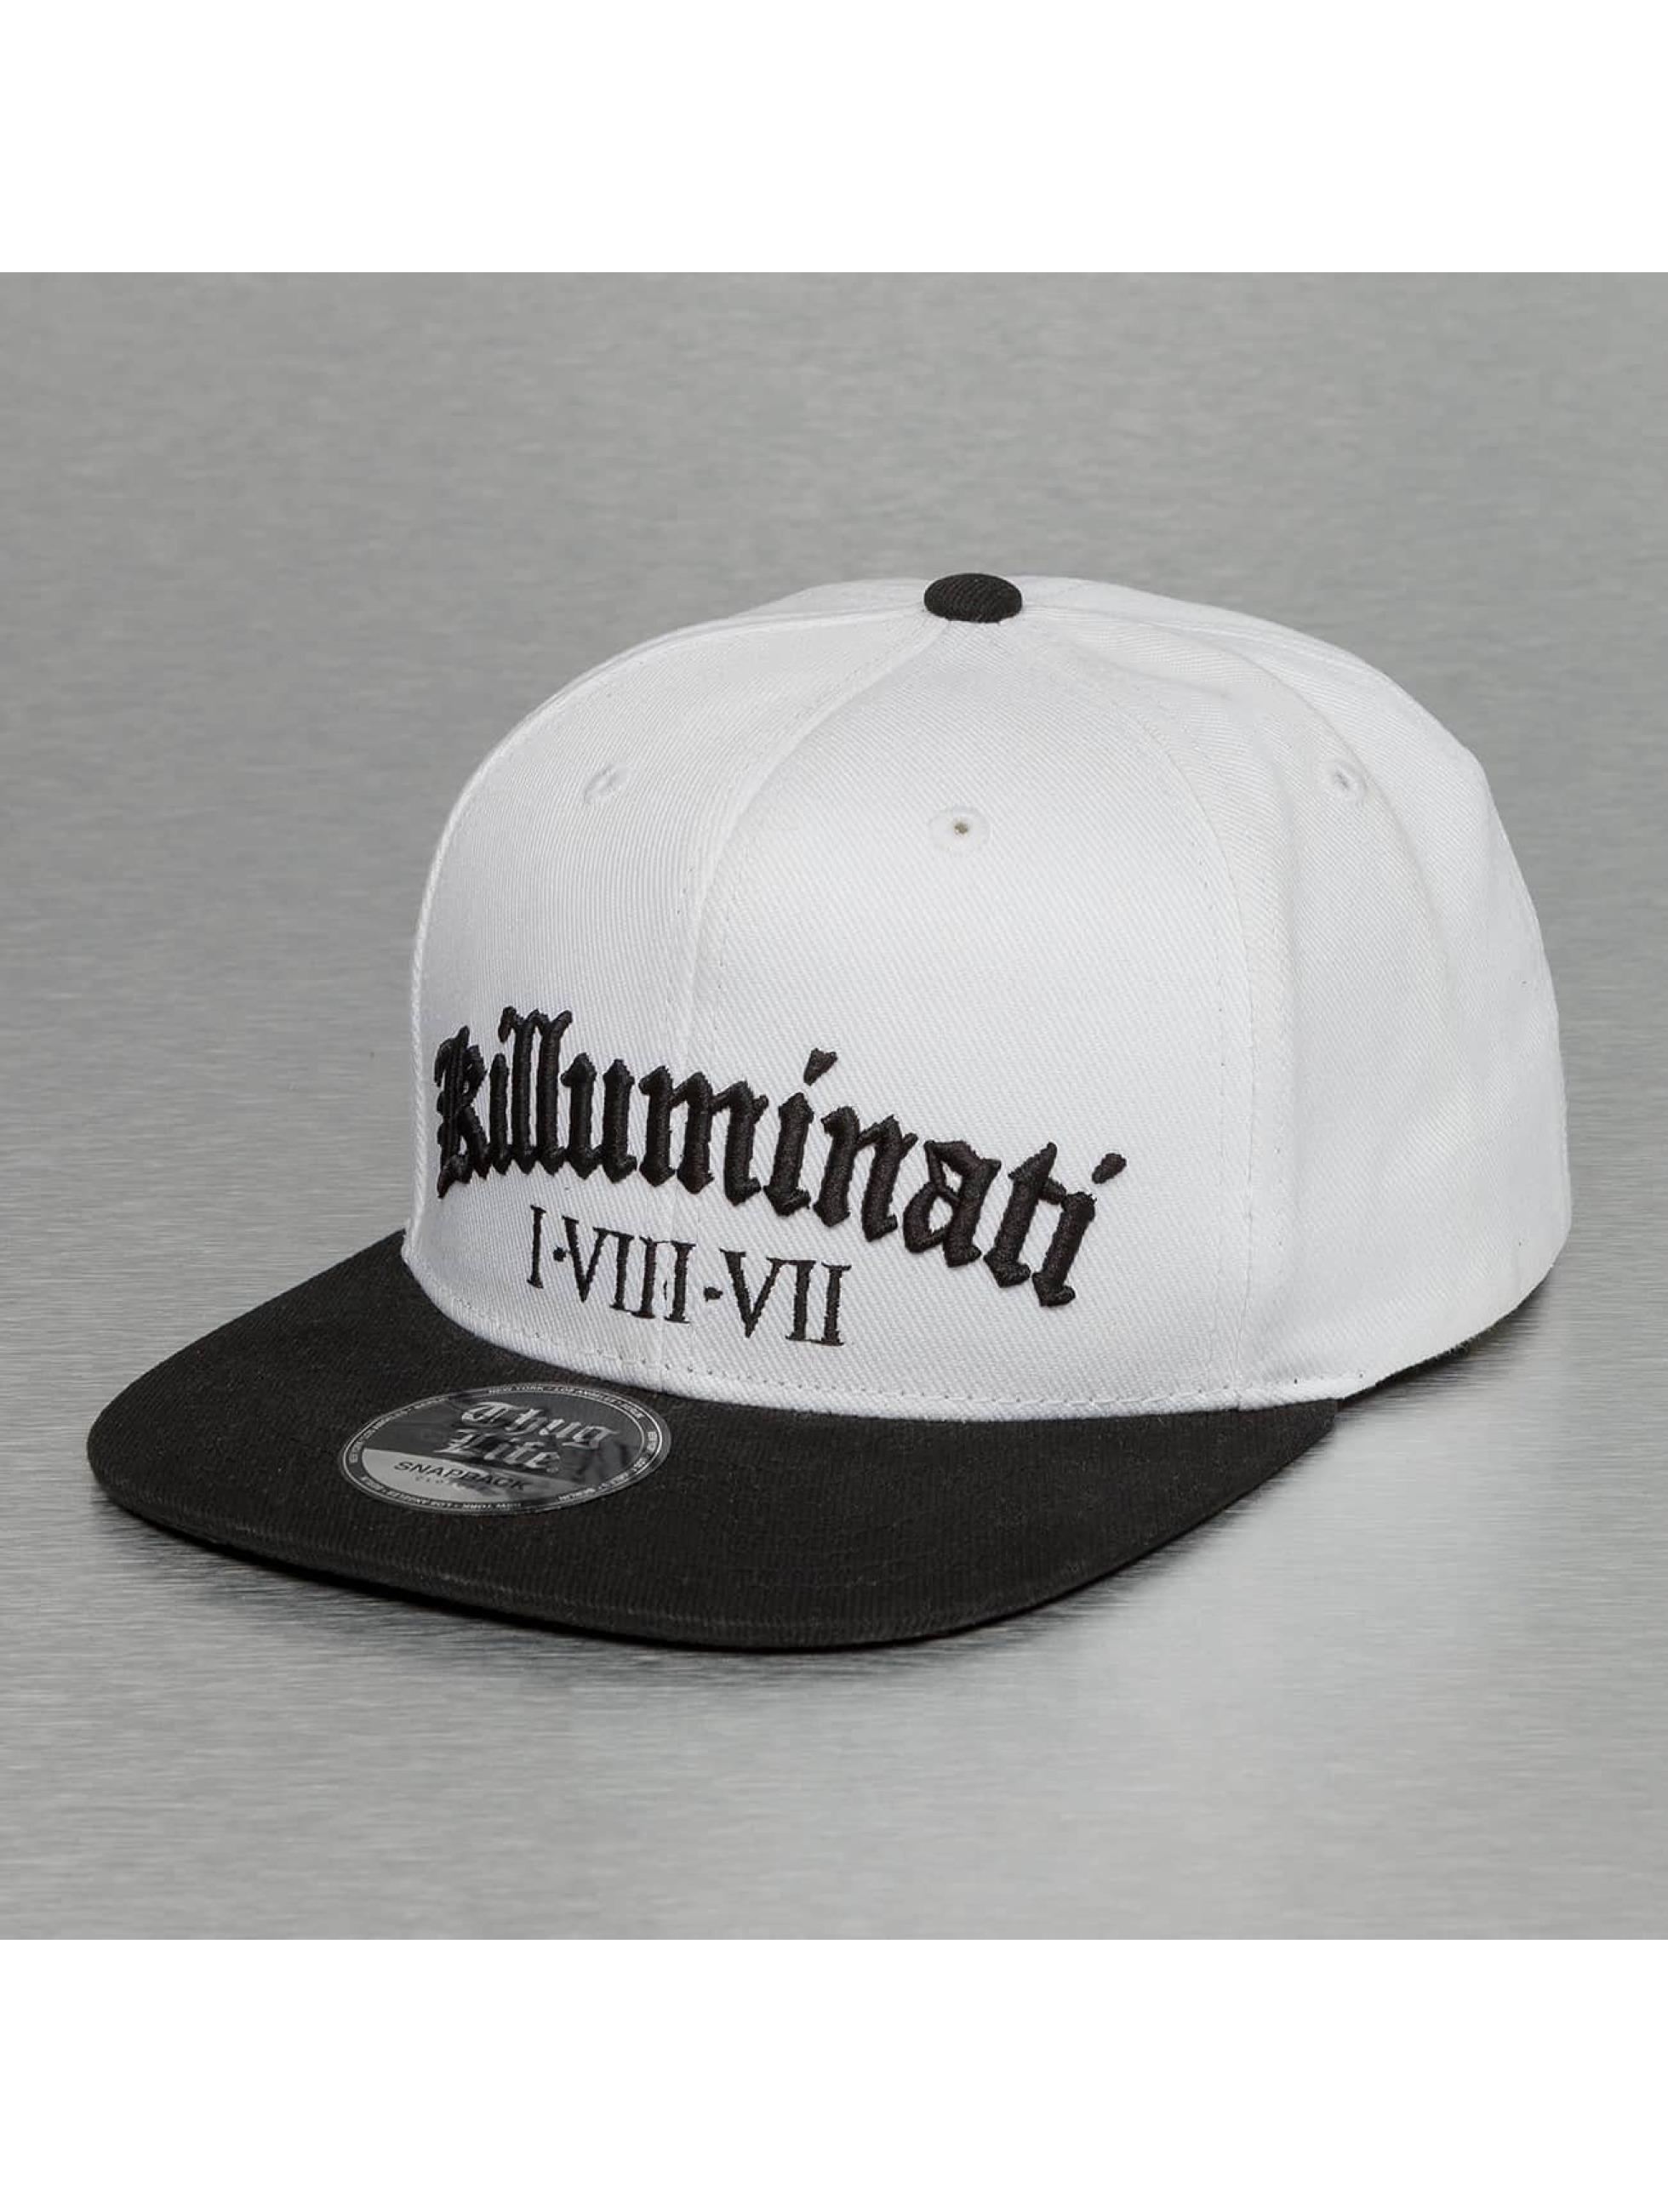 Thug Life Кепка с застёжкой Killuminati белый